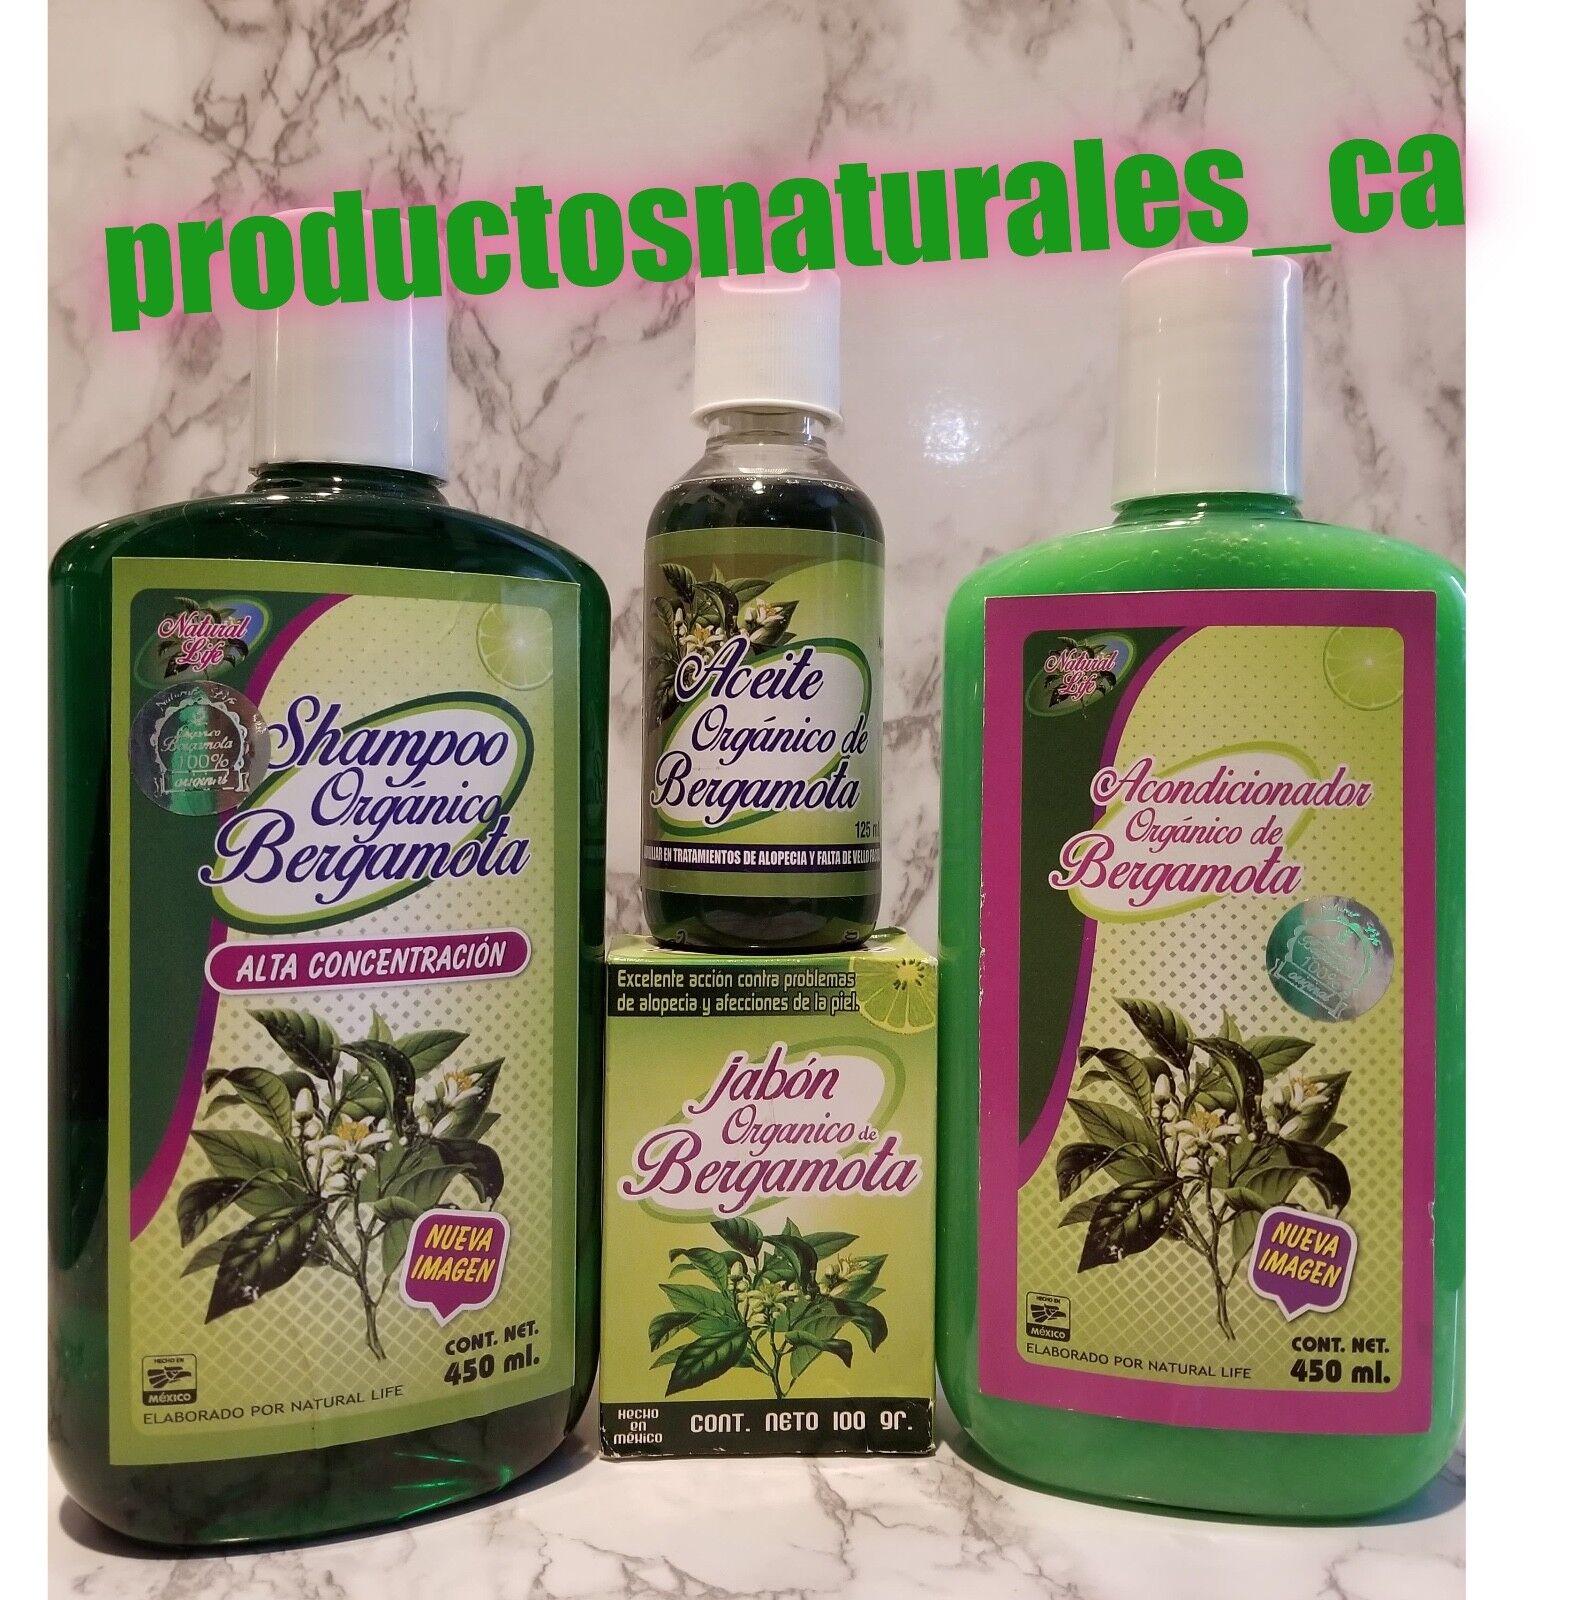 ORGANIC BERGAMOT SHAMPOO COMBO 100% Natural & Original *Hair Loss* (4Pack)